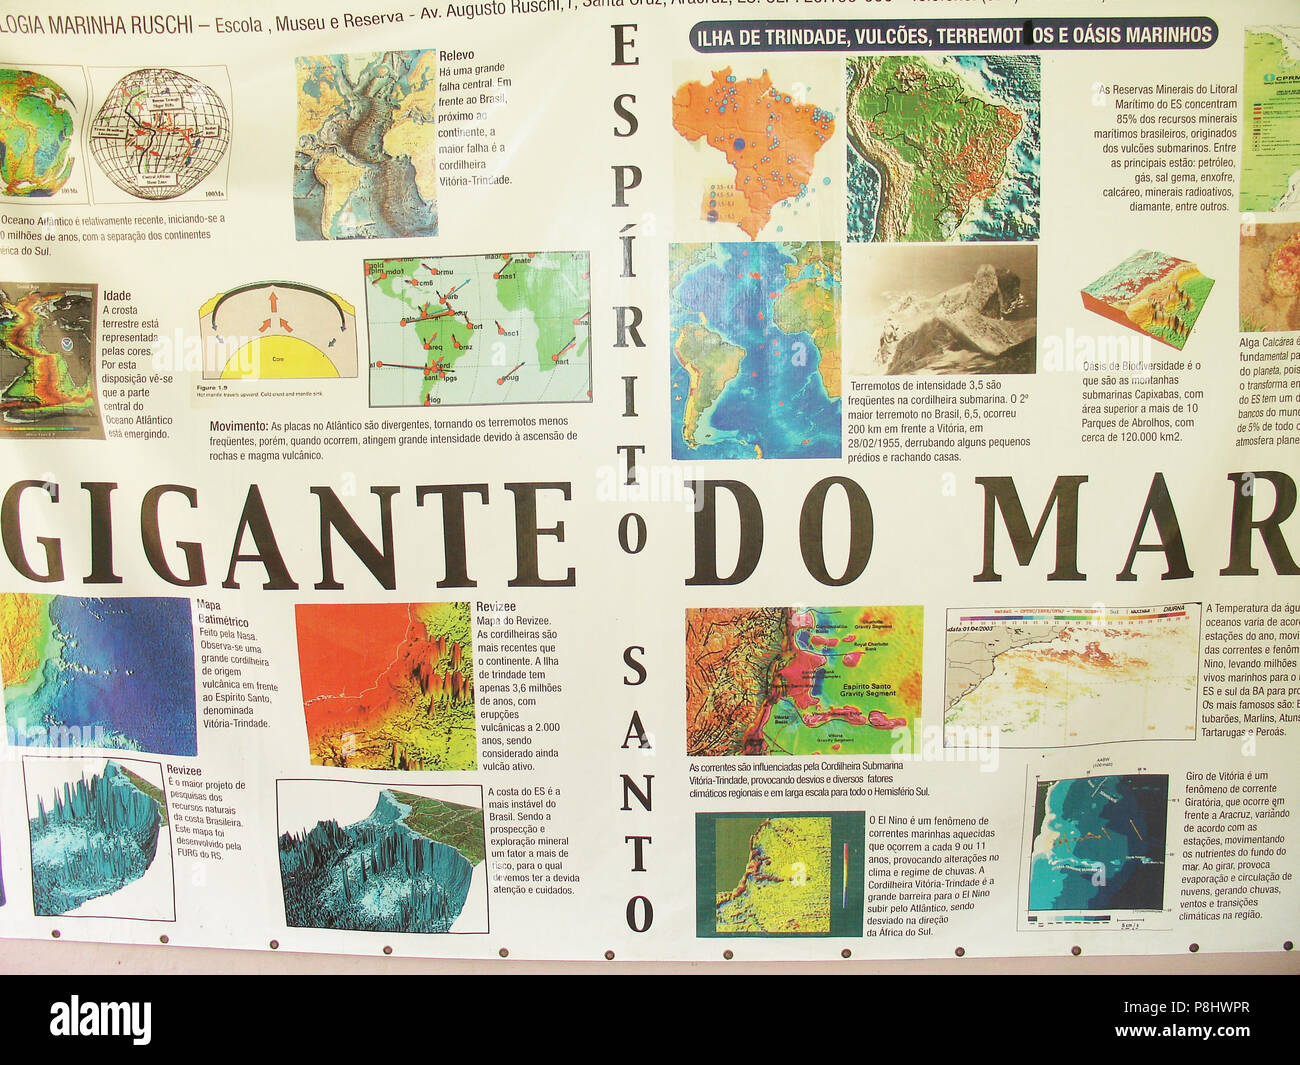 Carte Marine Bresil.La Carte La Mer Geant Biologie Marine Gare Ruschi Santa